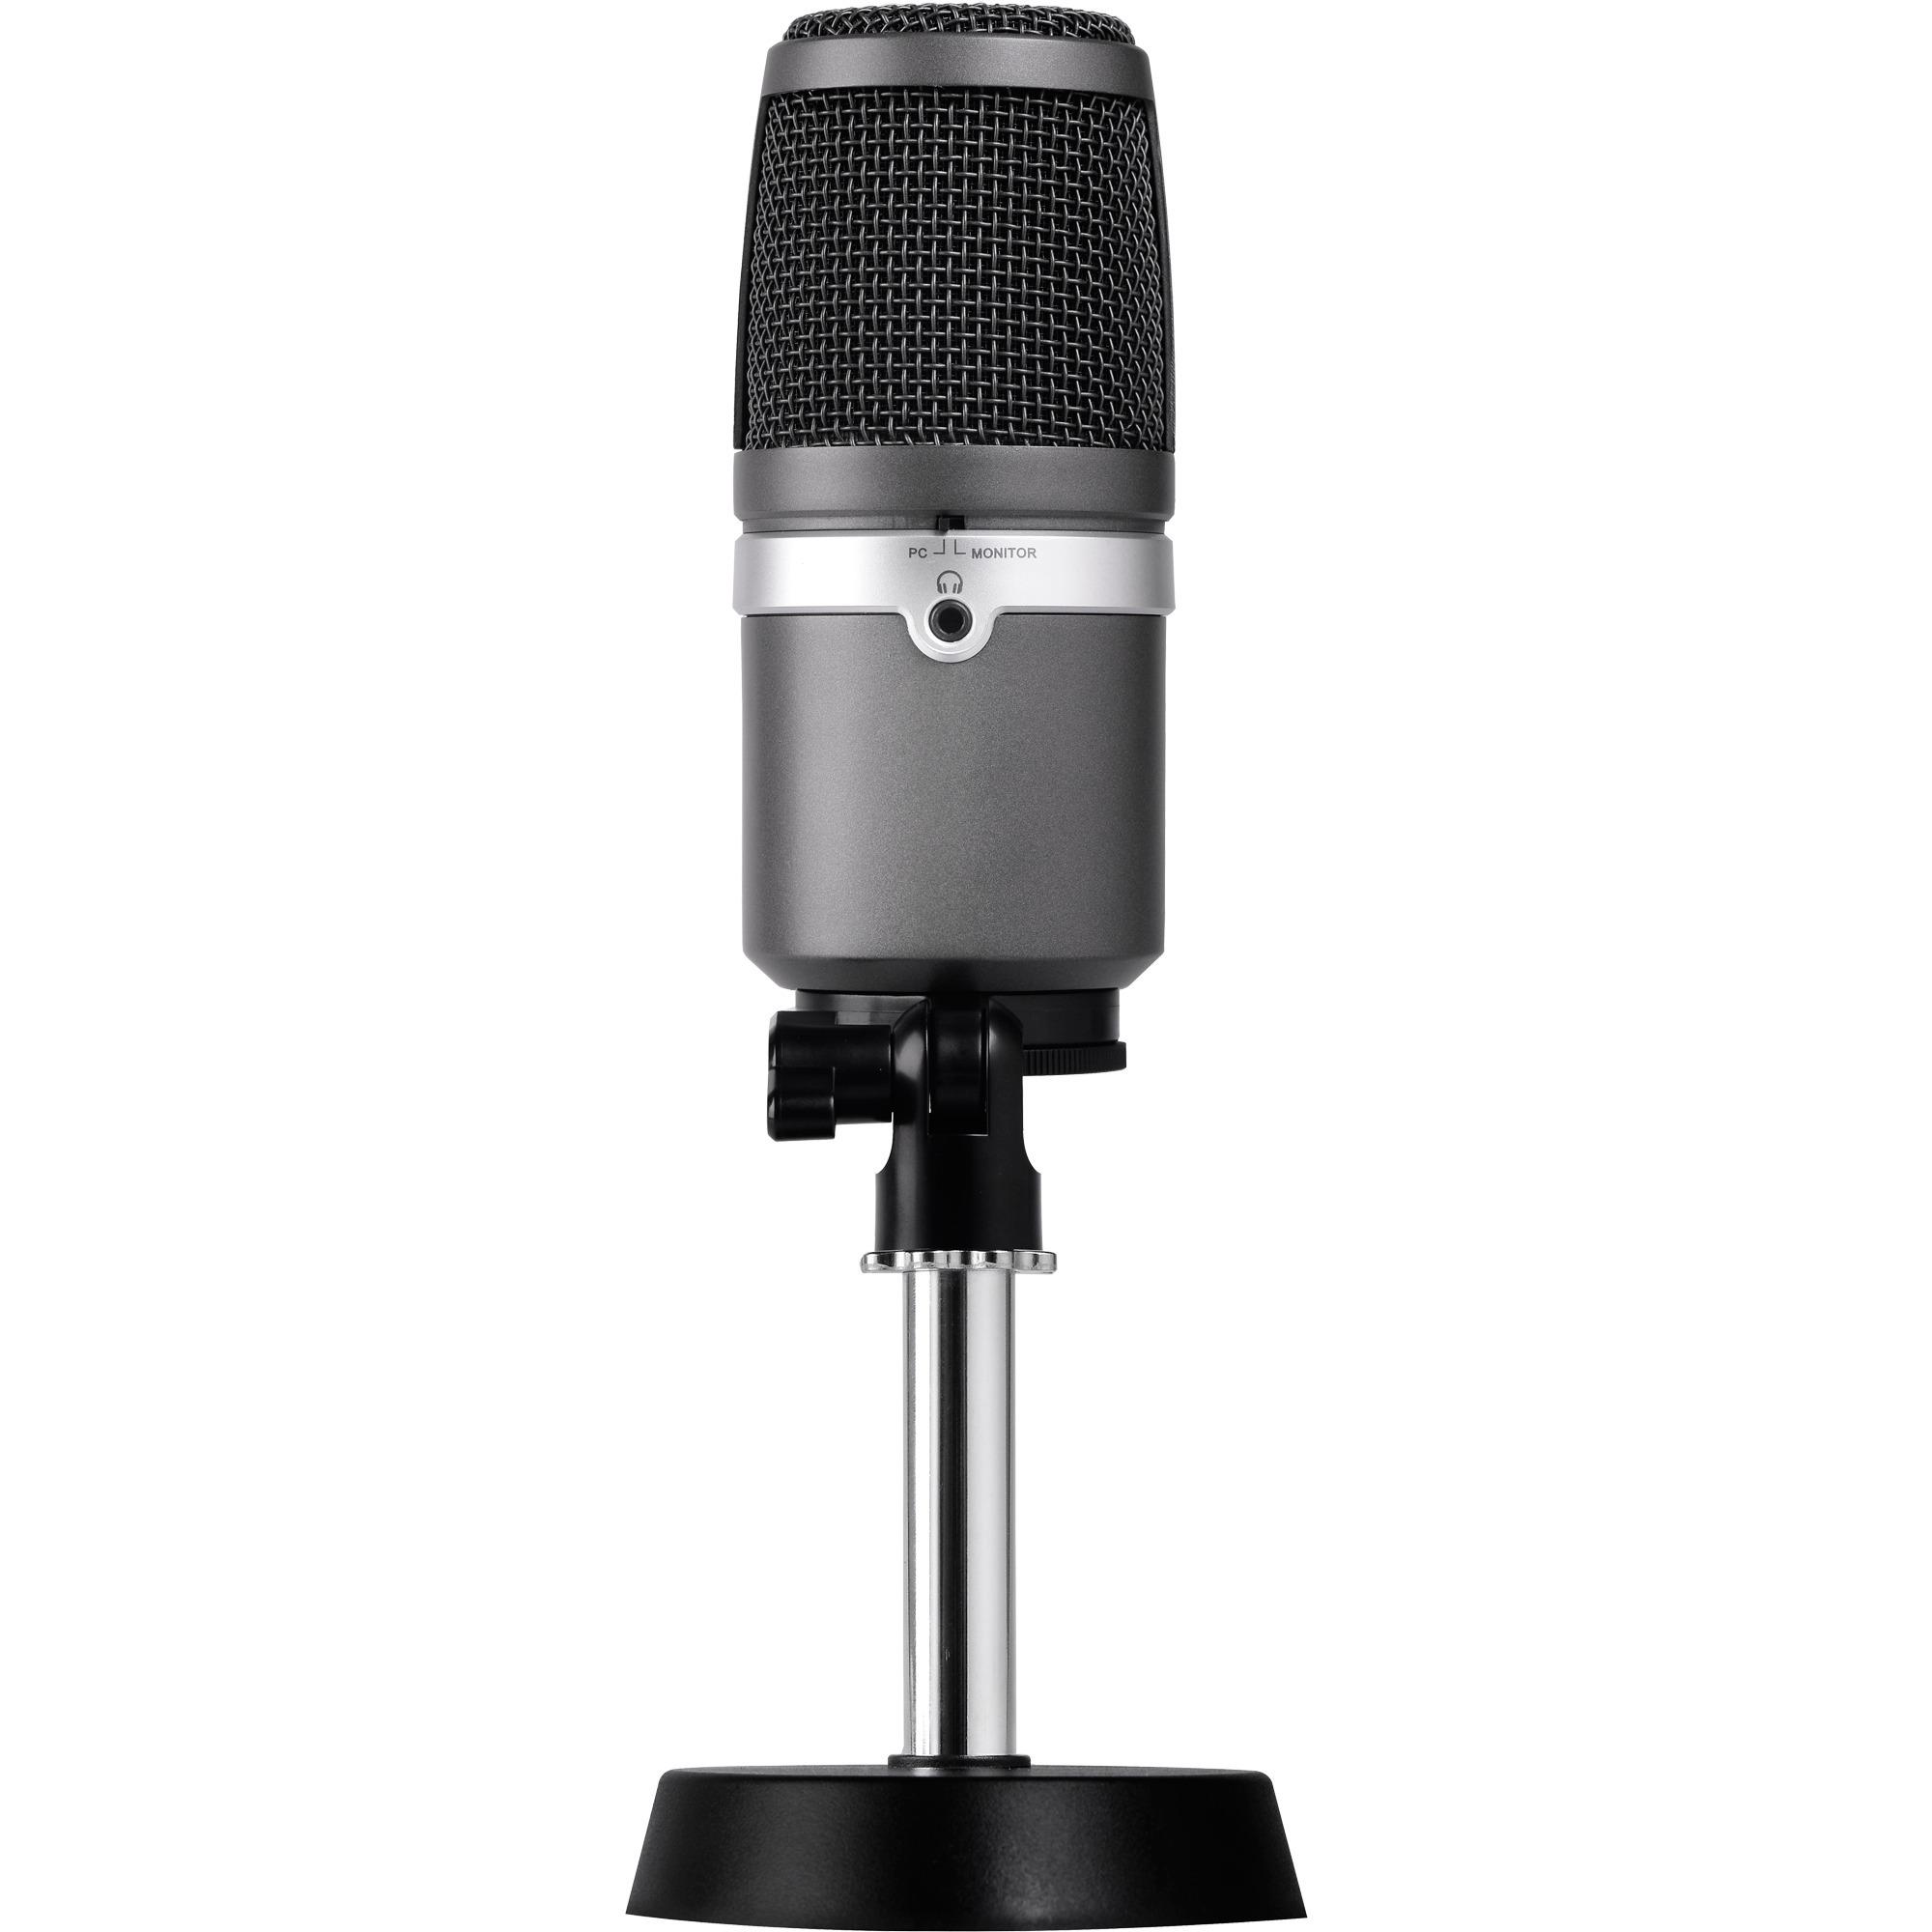 Image of AM310 USB Microphone, Mikrofon